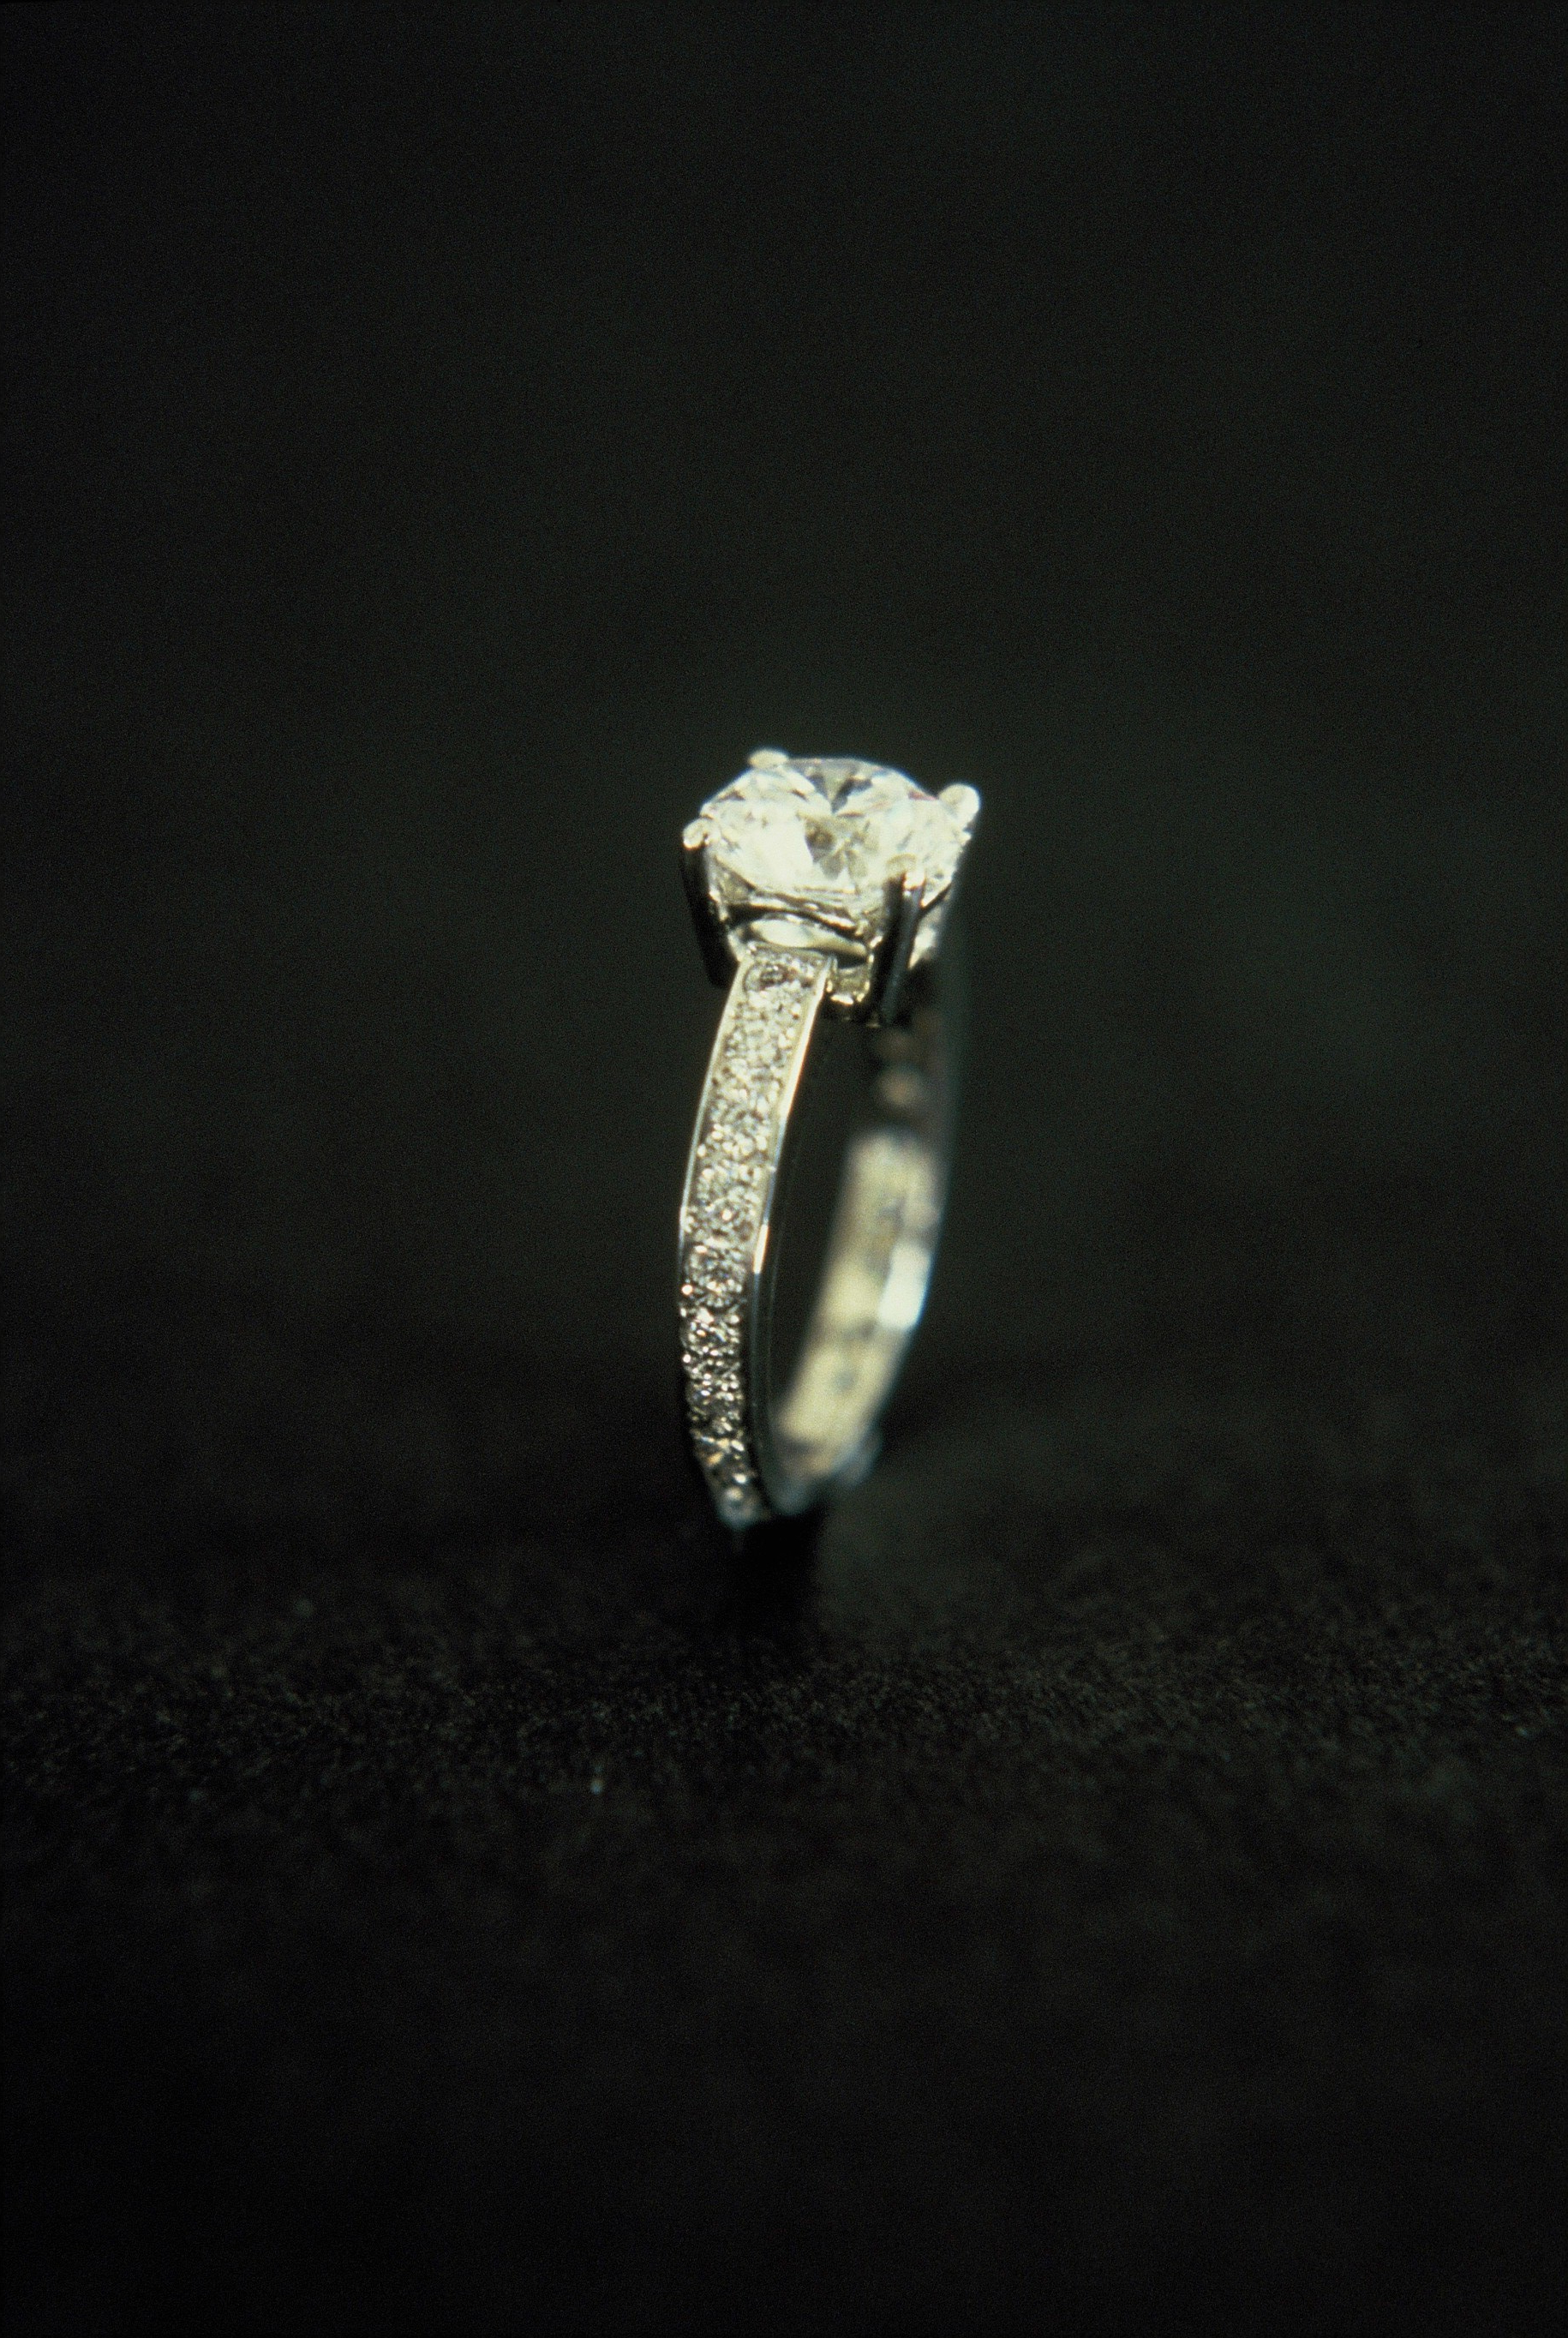 Round Brilliant Diamond Ring with Grain-set Diamond Band